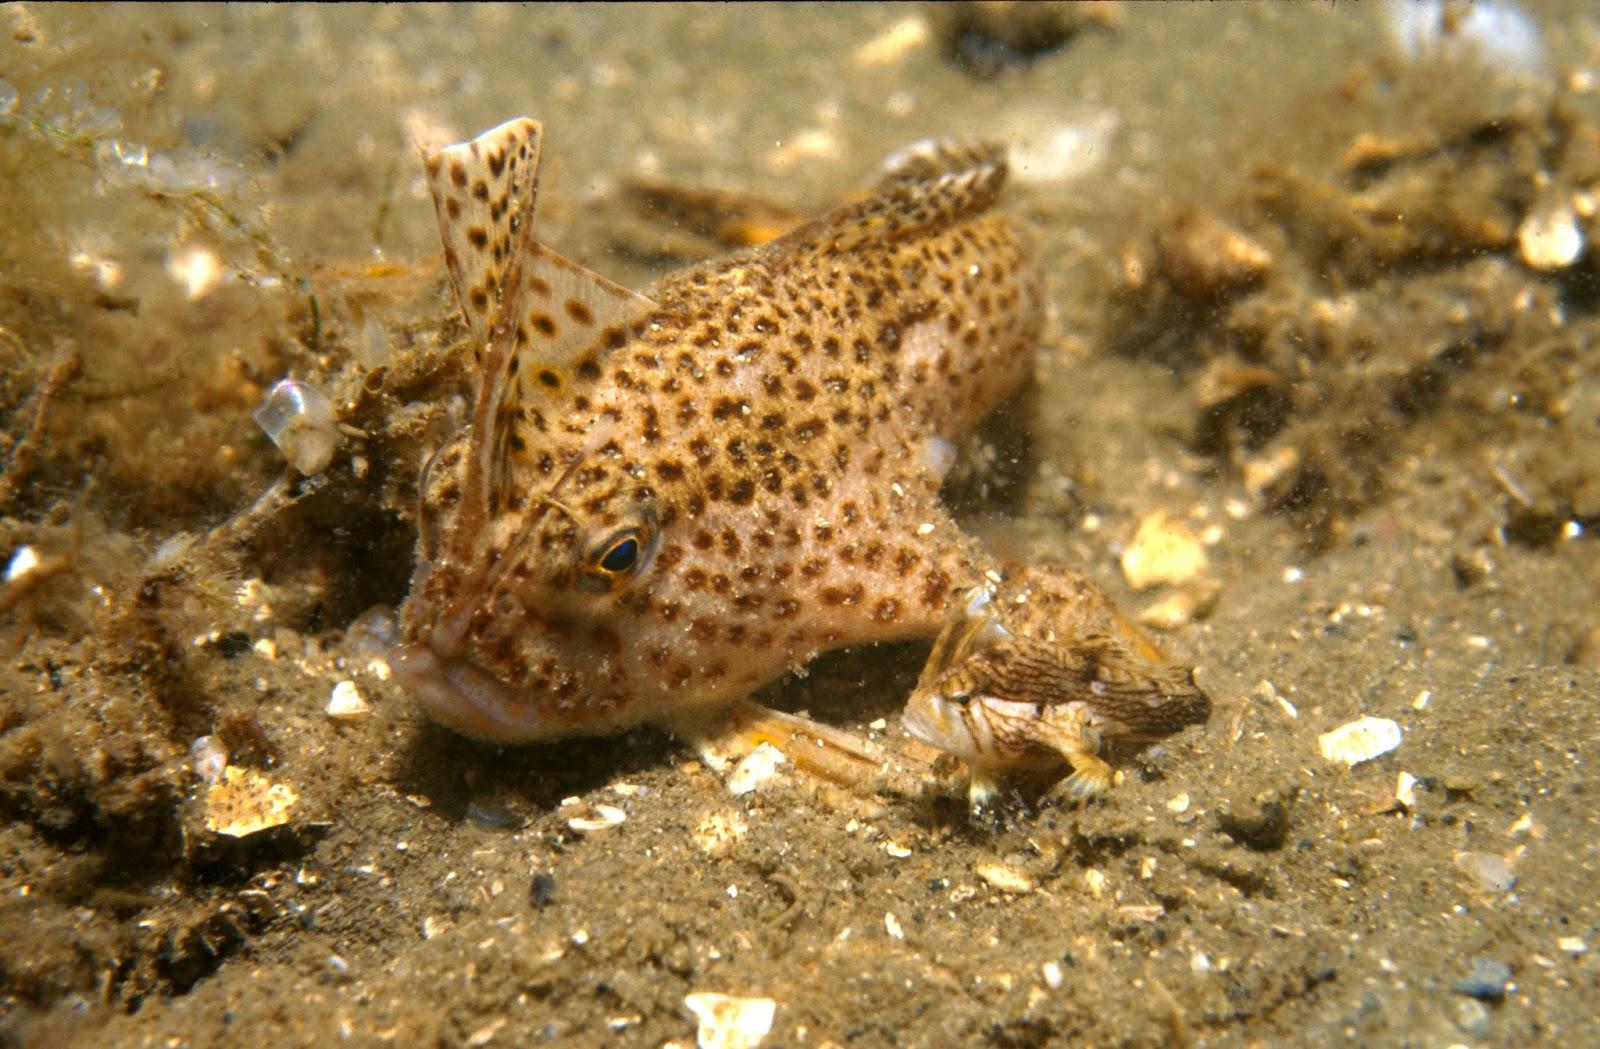 http://fishshare.blogspot.com/2015/01/handfish-pictures-3.html